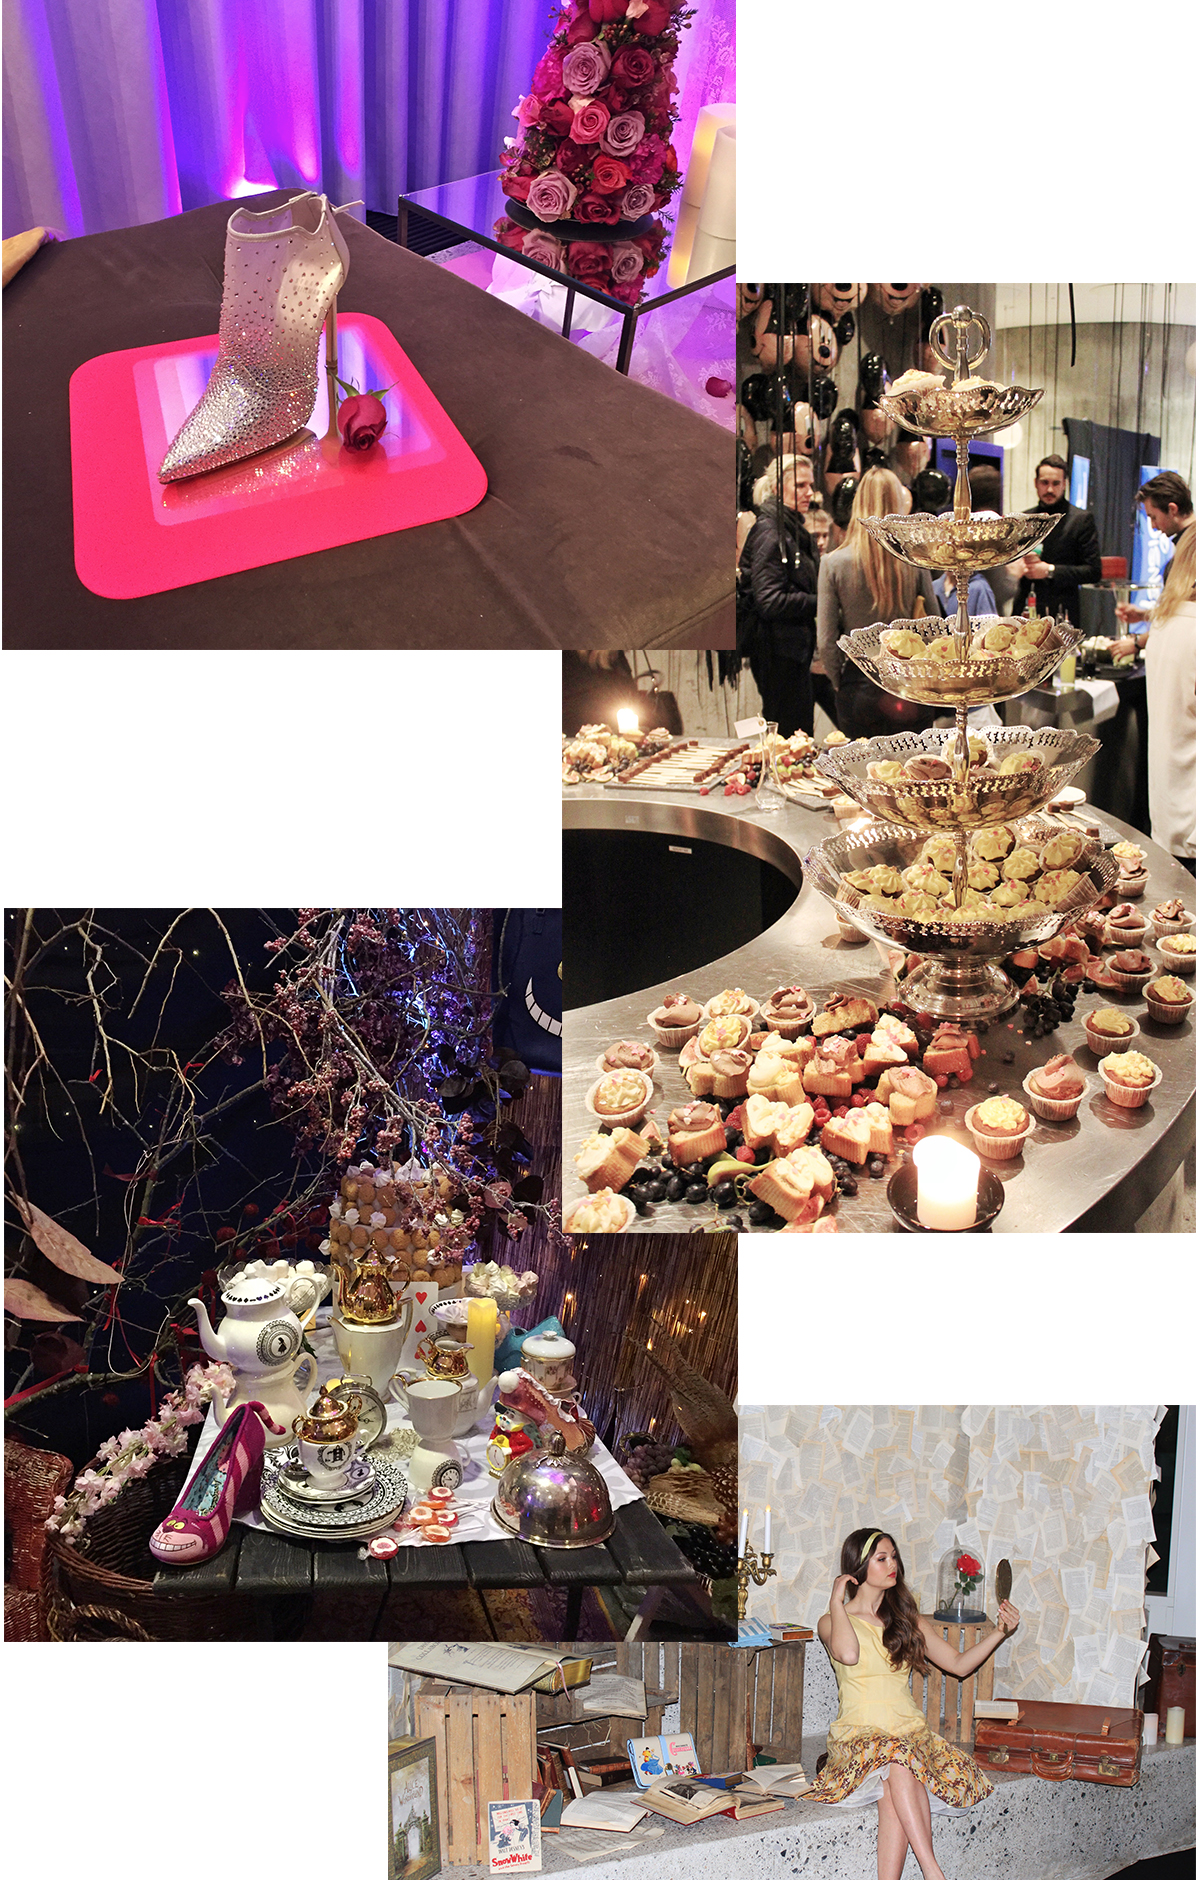 Copenhagen fashion week 2016 Autumn Winter blog fashion lifestyle events disney1